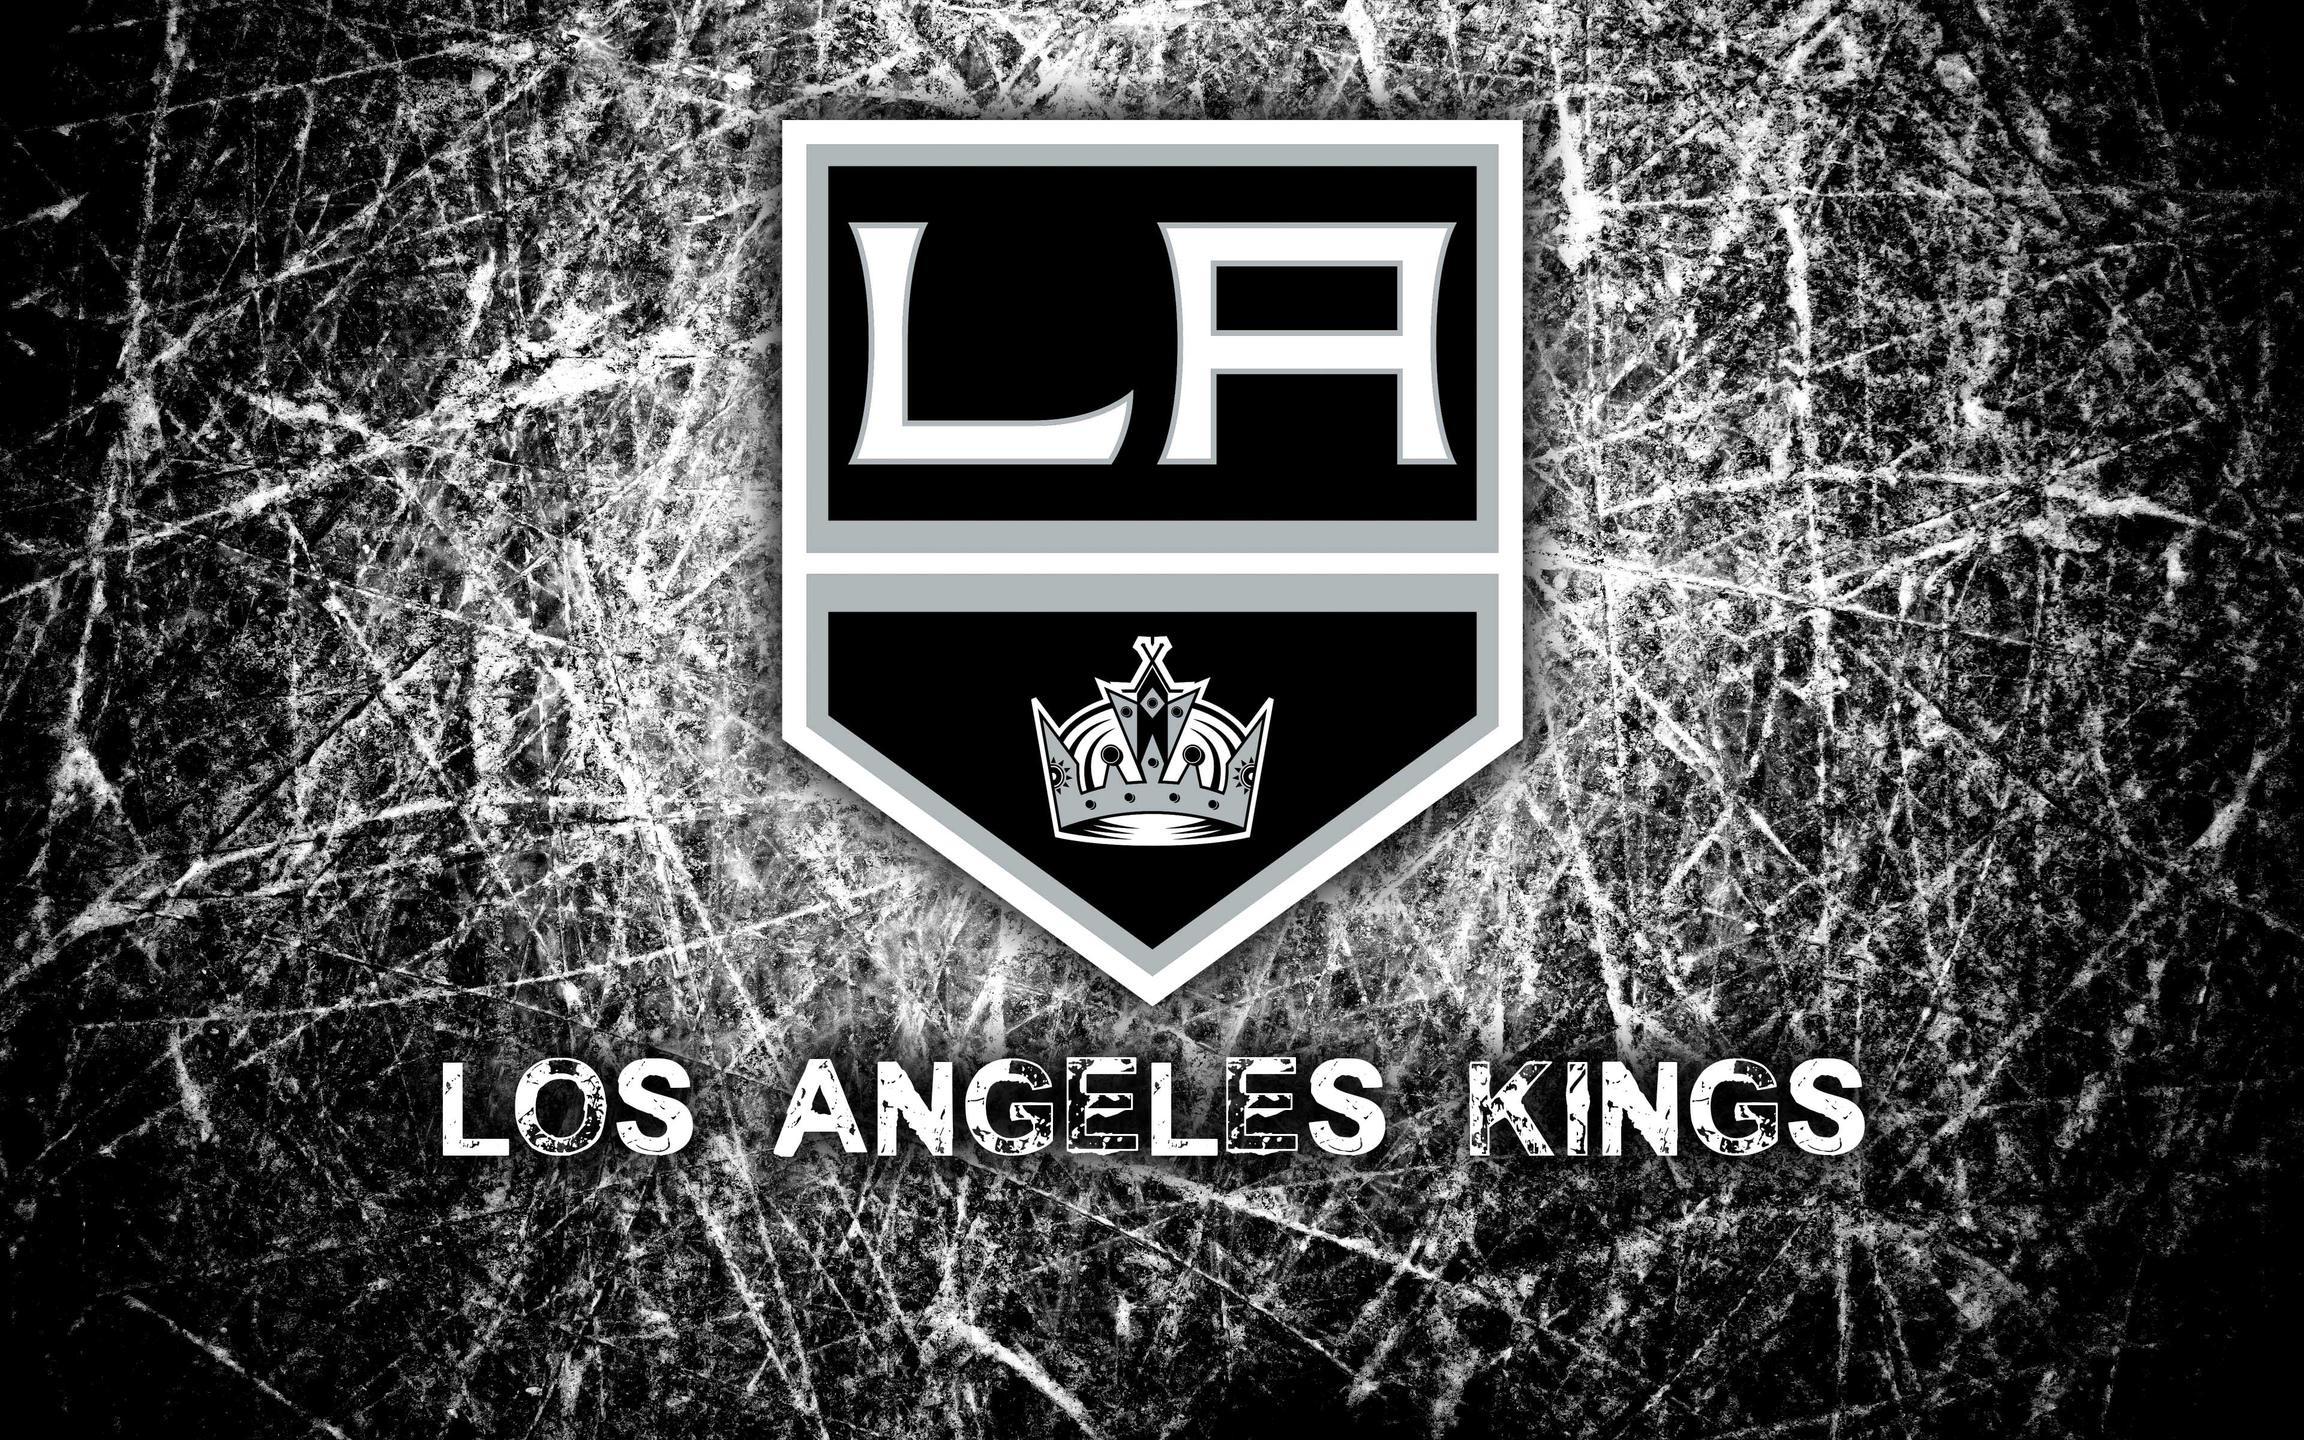 Los Angeles Kings 2014 Logo Wallpaper Wide or HD | Sports Wallpapers